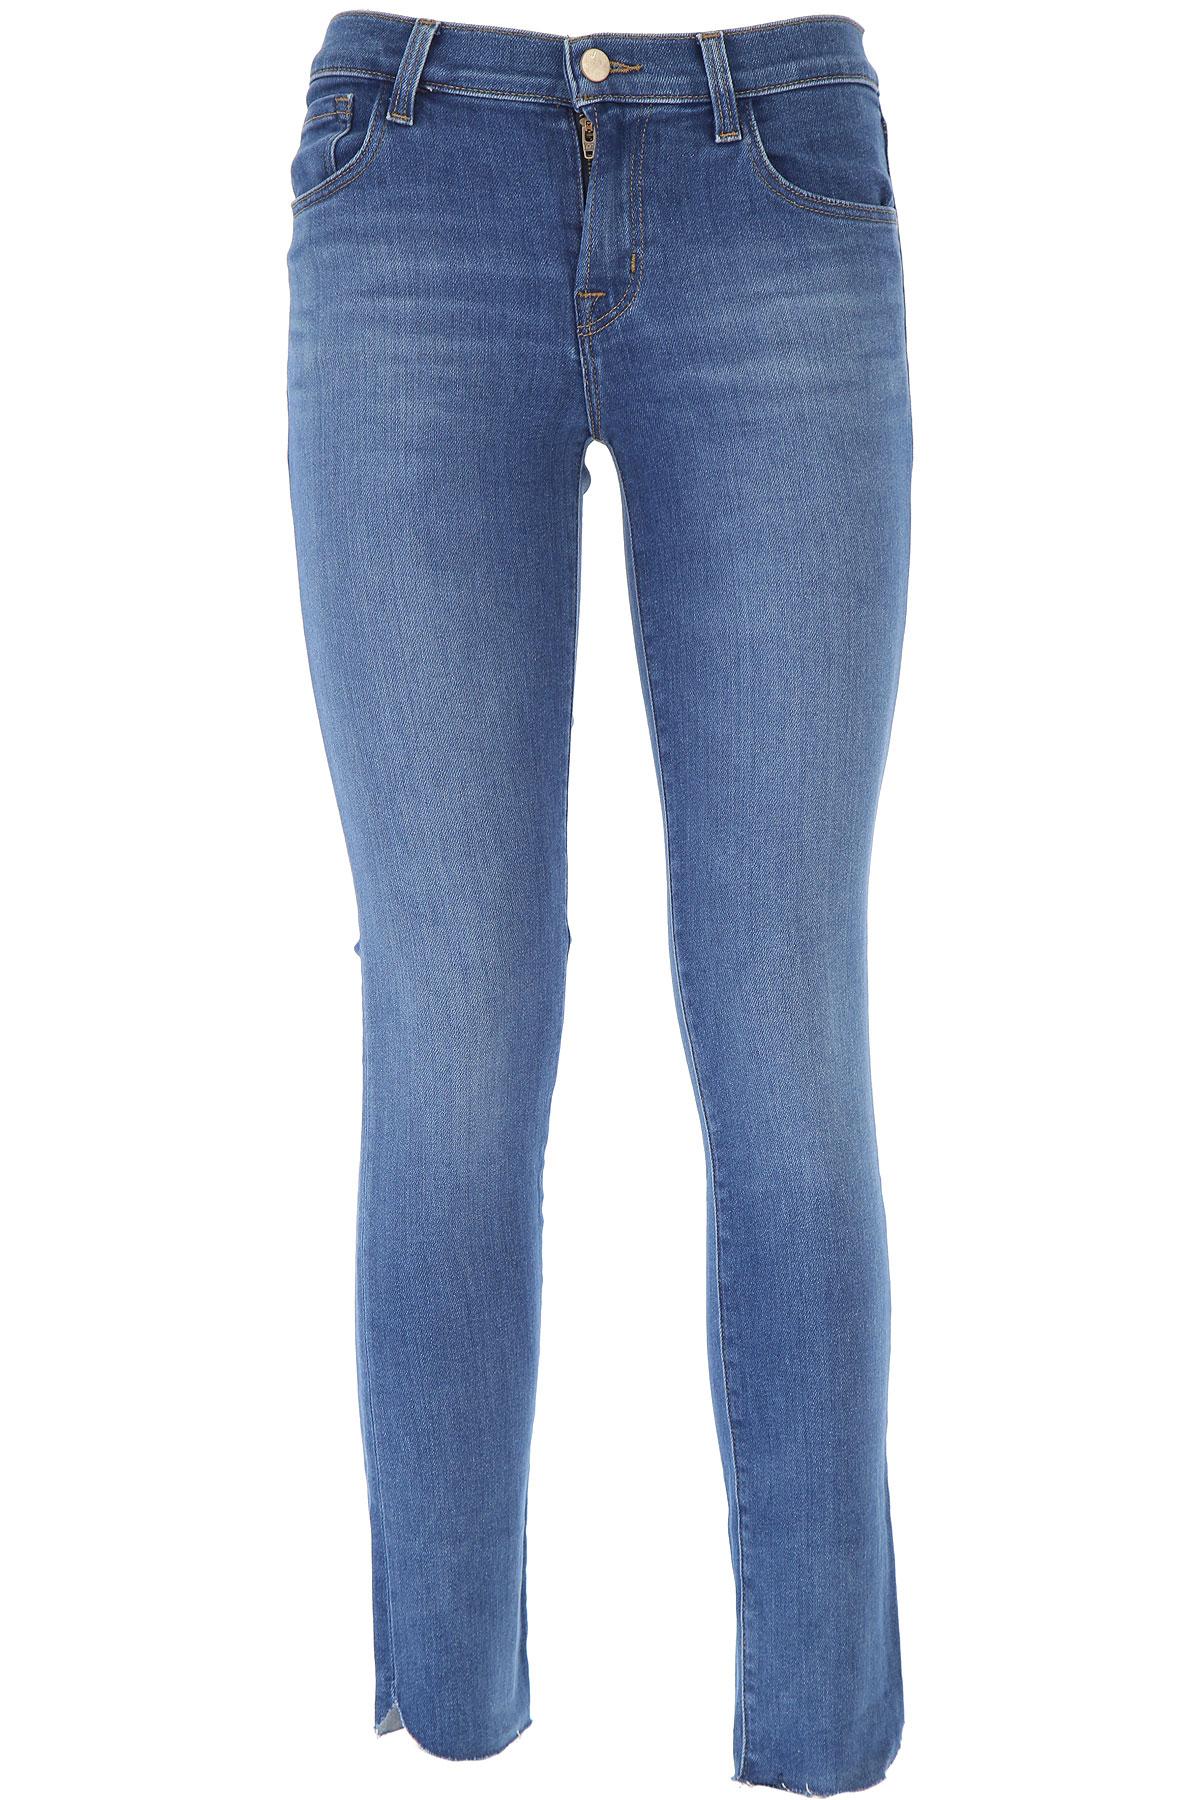 J Brand Jeans On Sale, Blue Denim, Cotton, 2019, 25 27 29